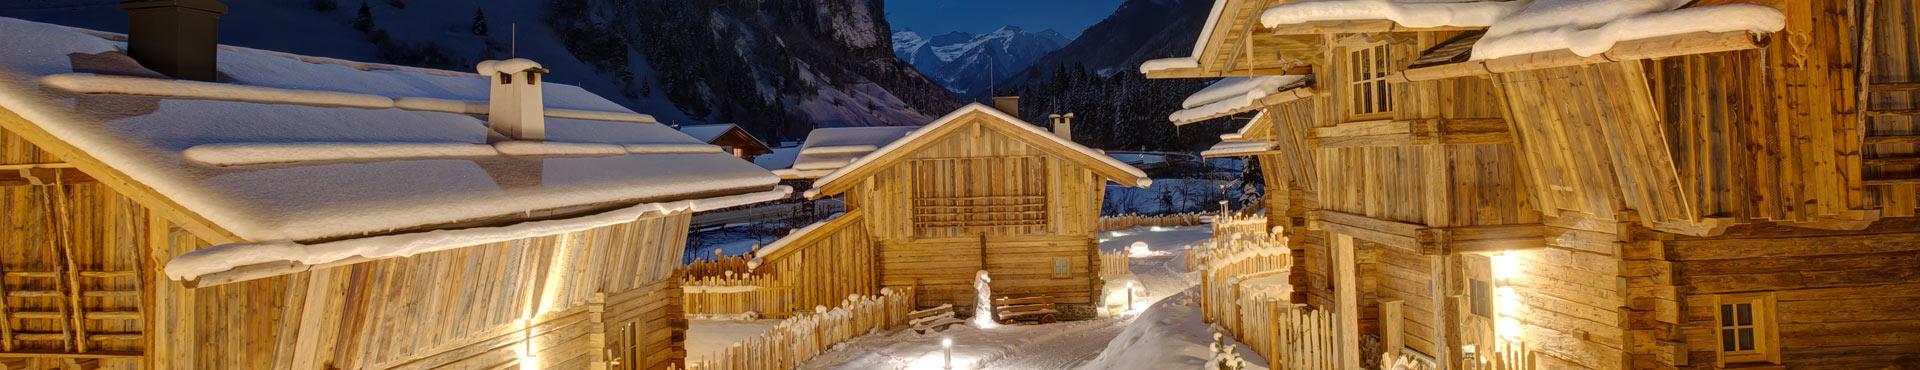 Chalets Winter